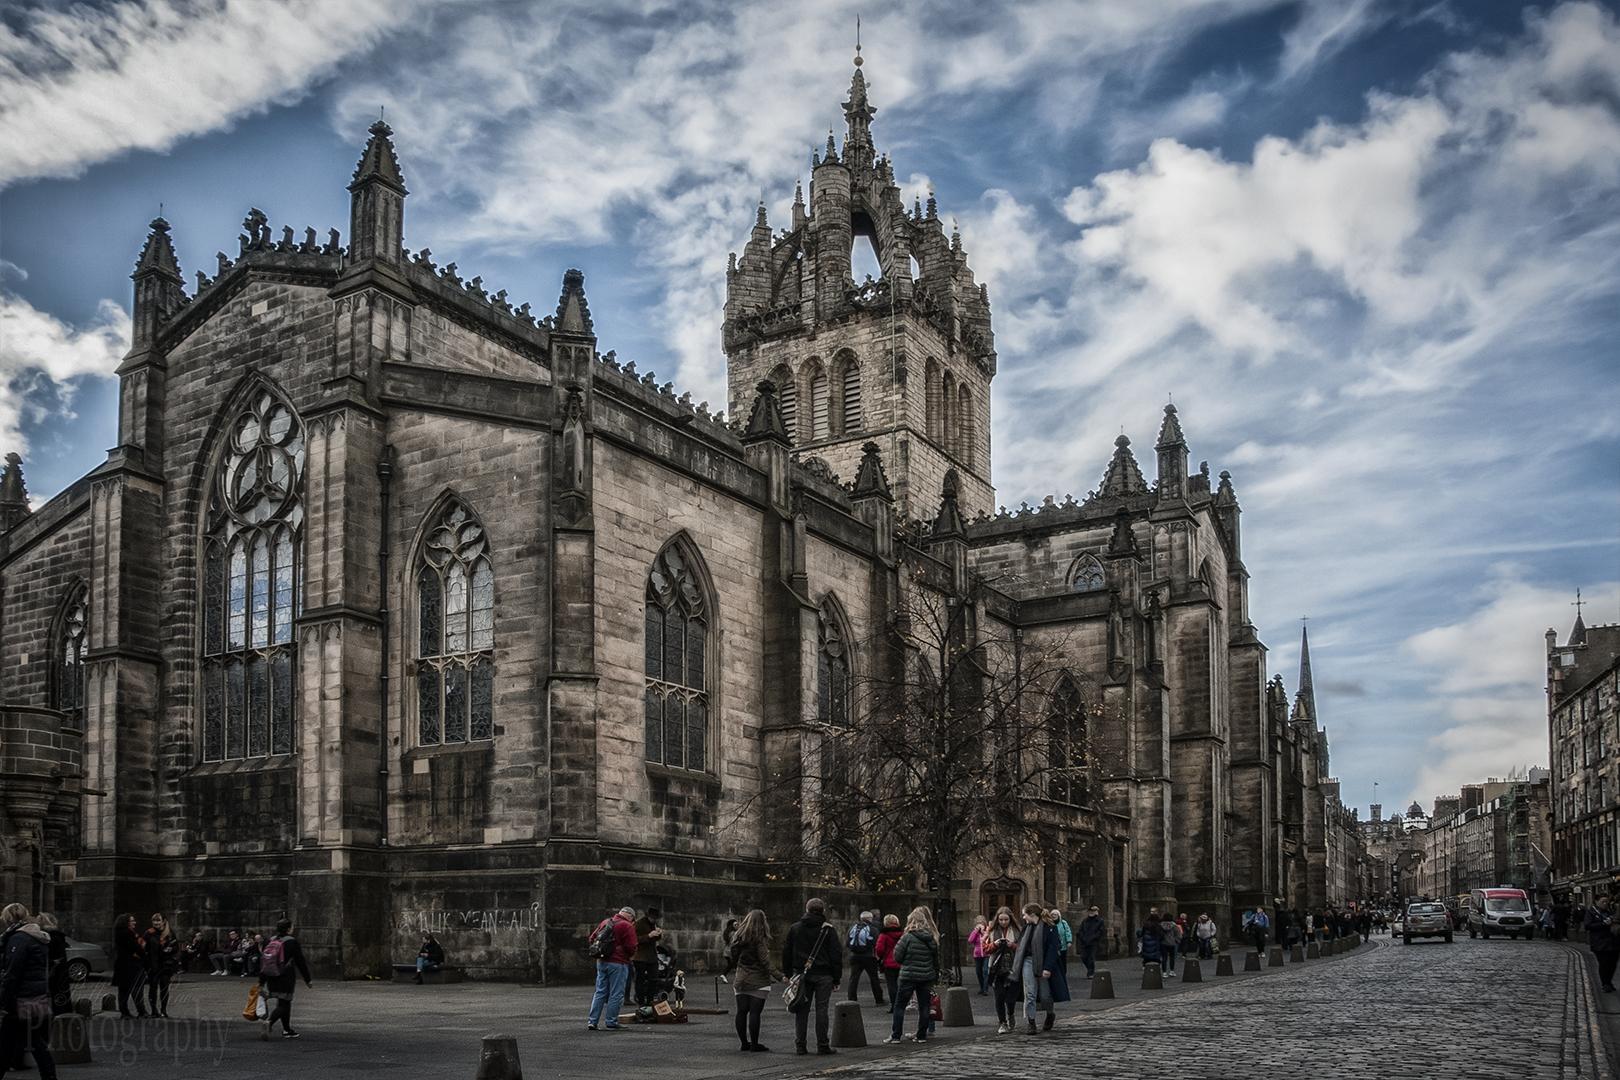 St Giles - WITH Persepctive Warp.jpg